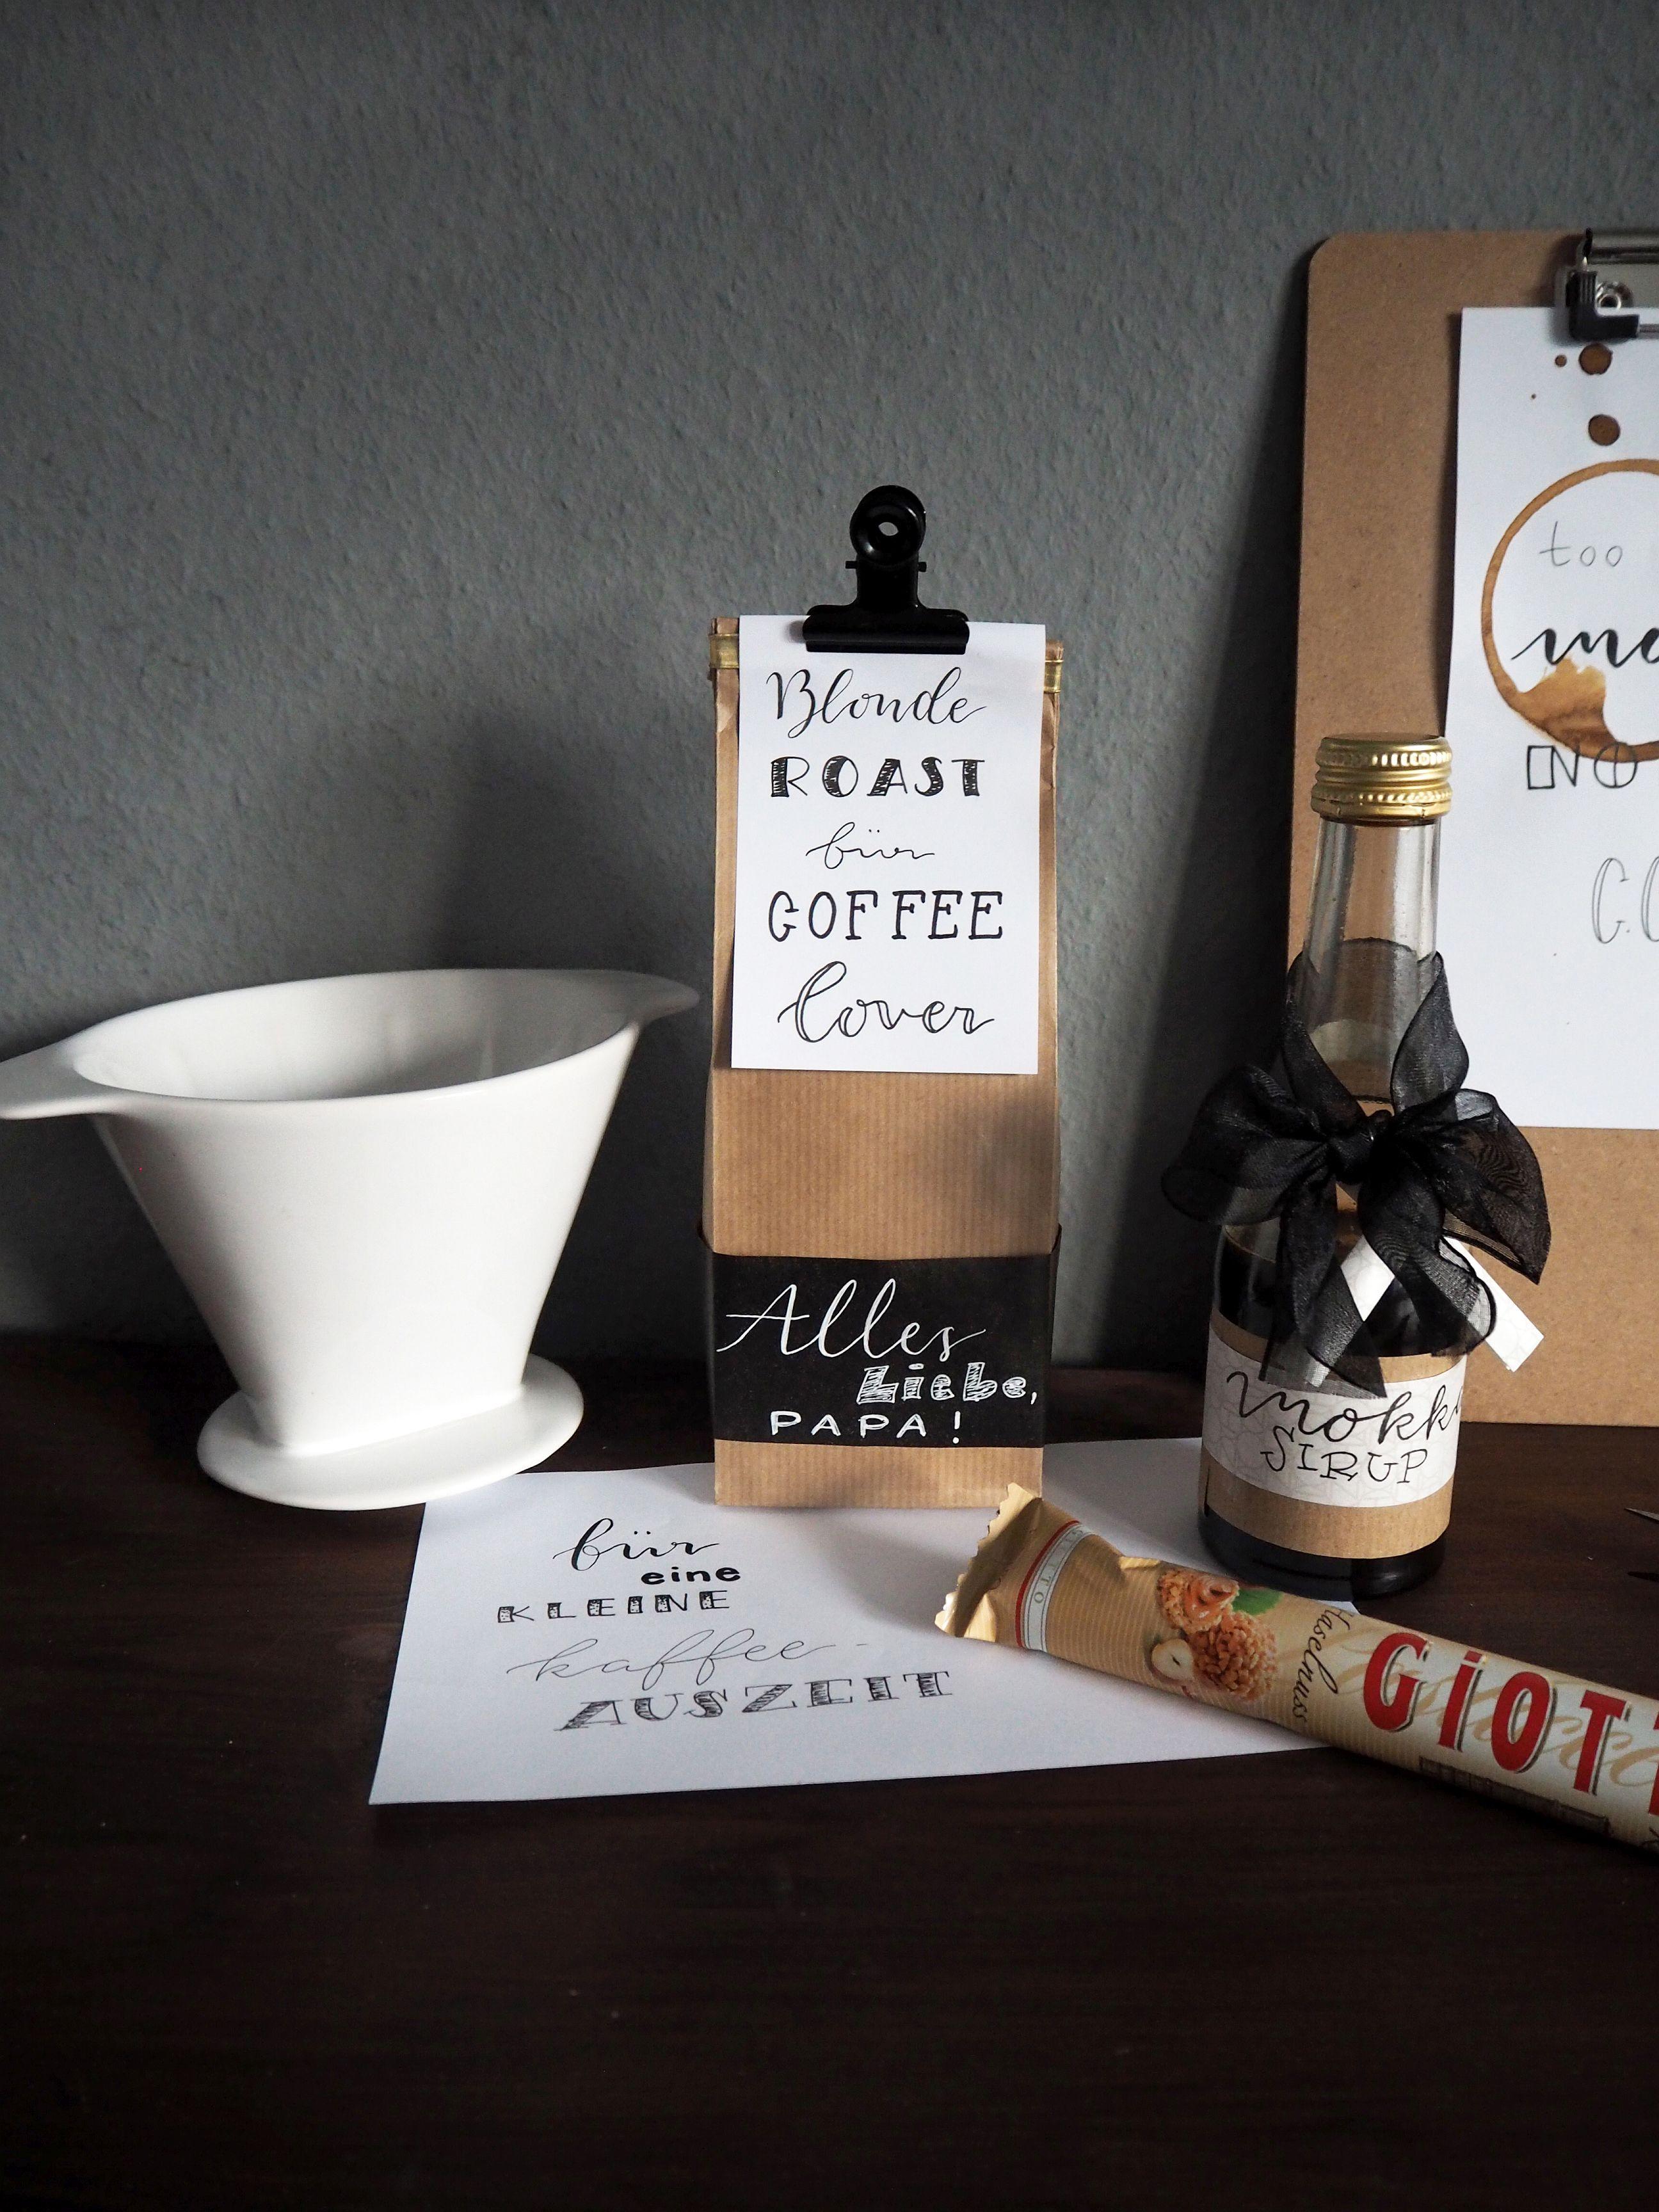 2018-05-skoen-och-kreativ-diy-lettering-set-fuer-kaffee-auszeit-zum-vatertag (5)